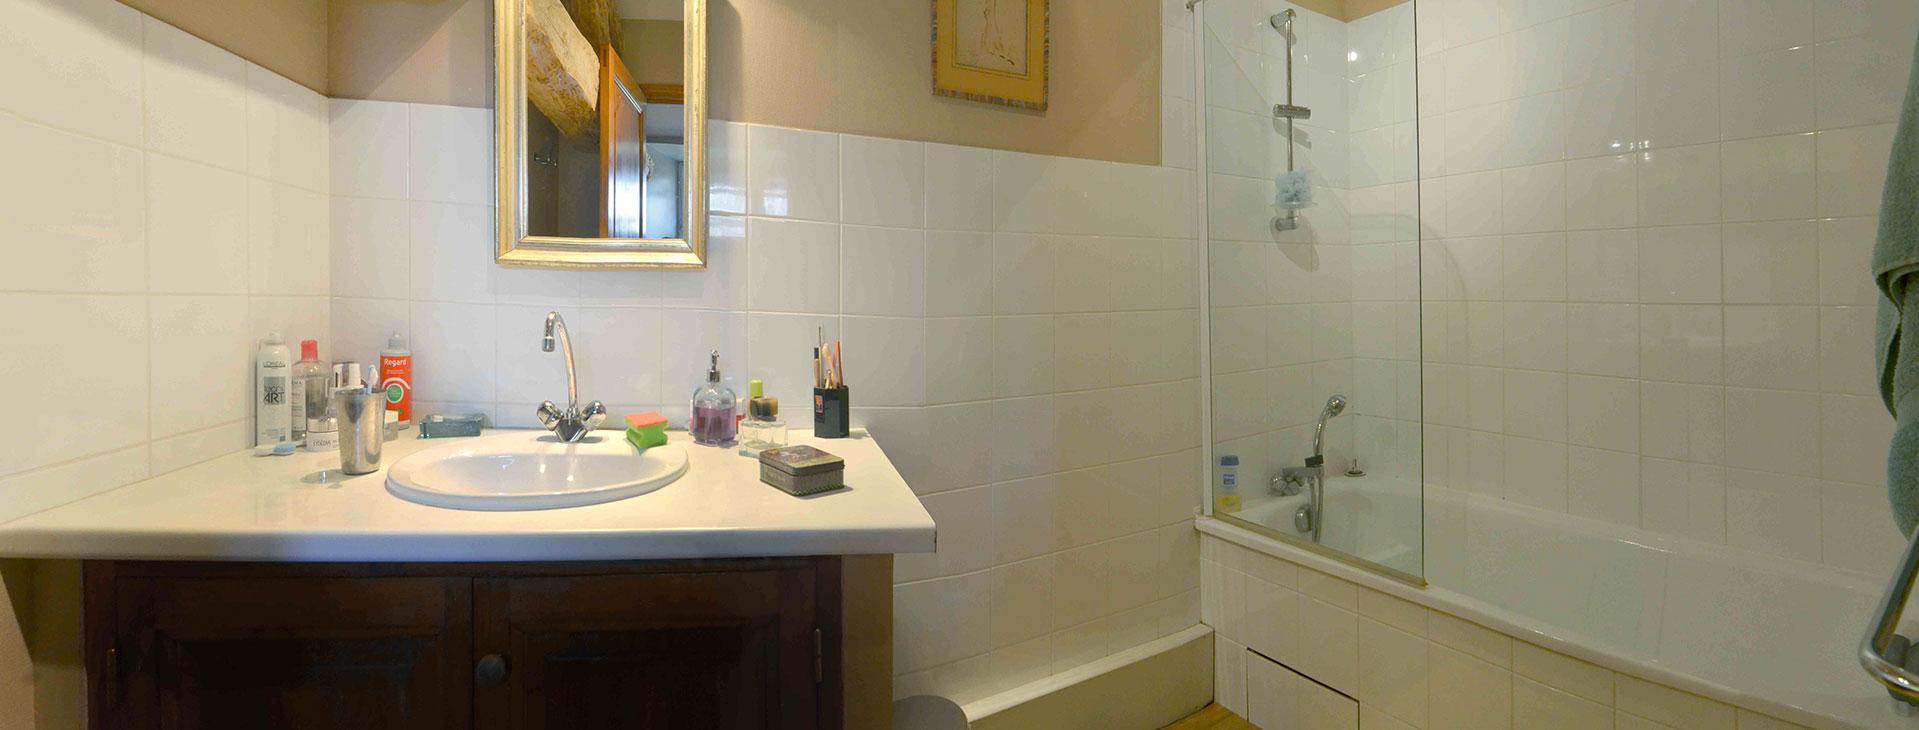 salle de bain à l'étage / Upstairs bathroom